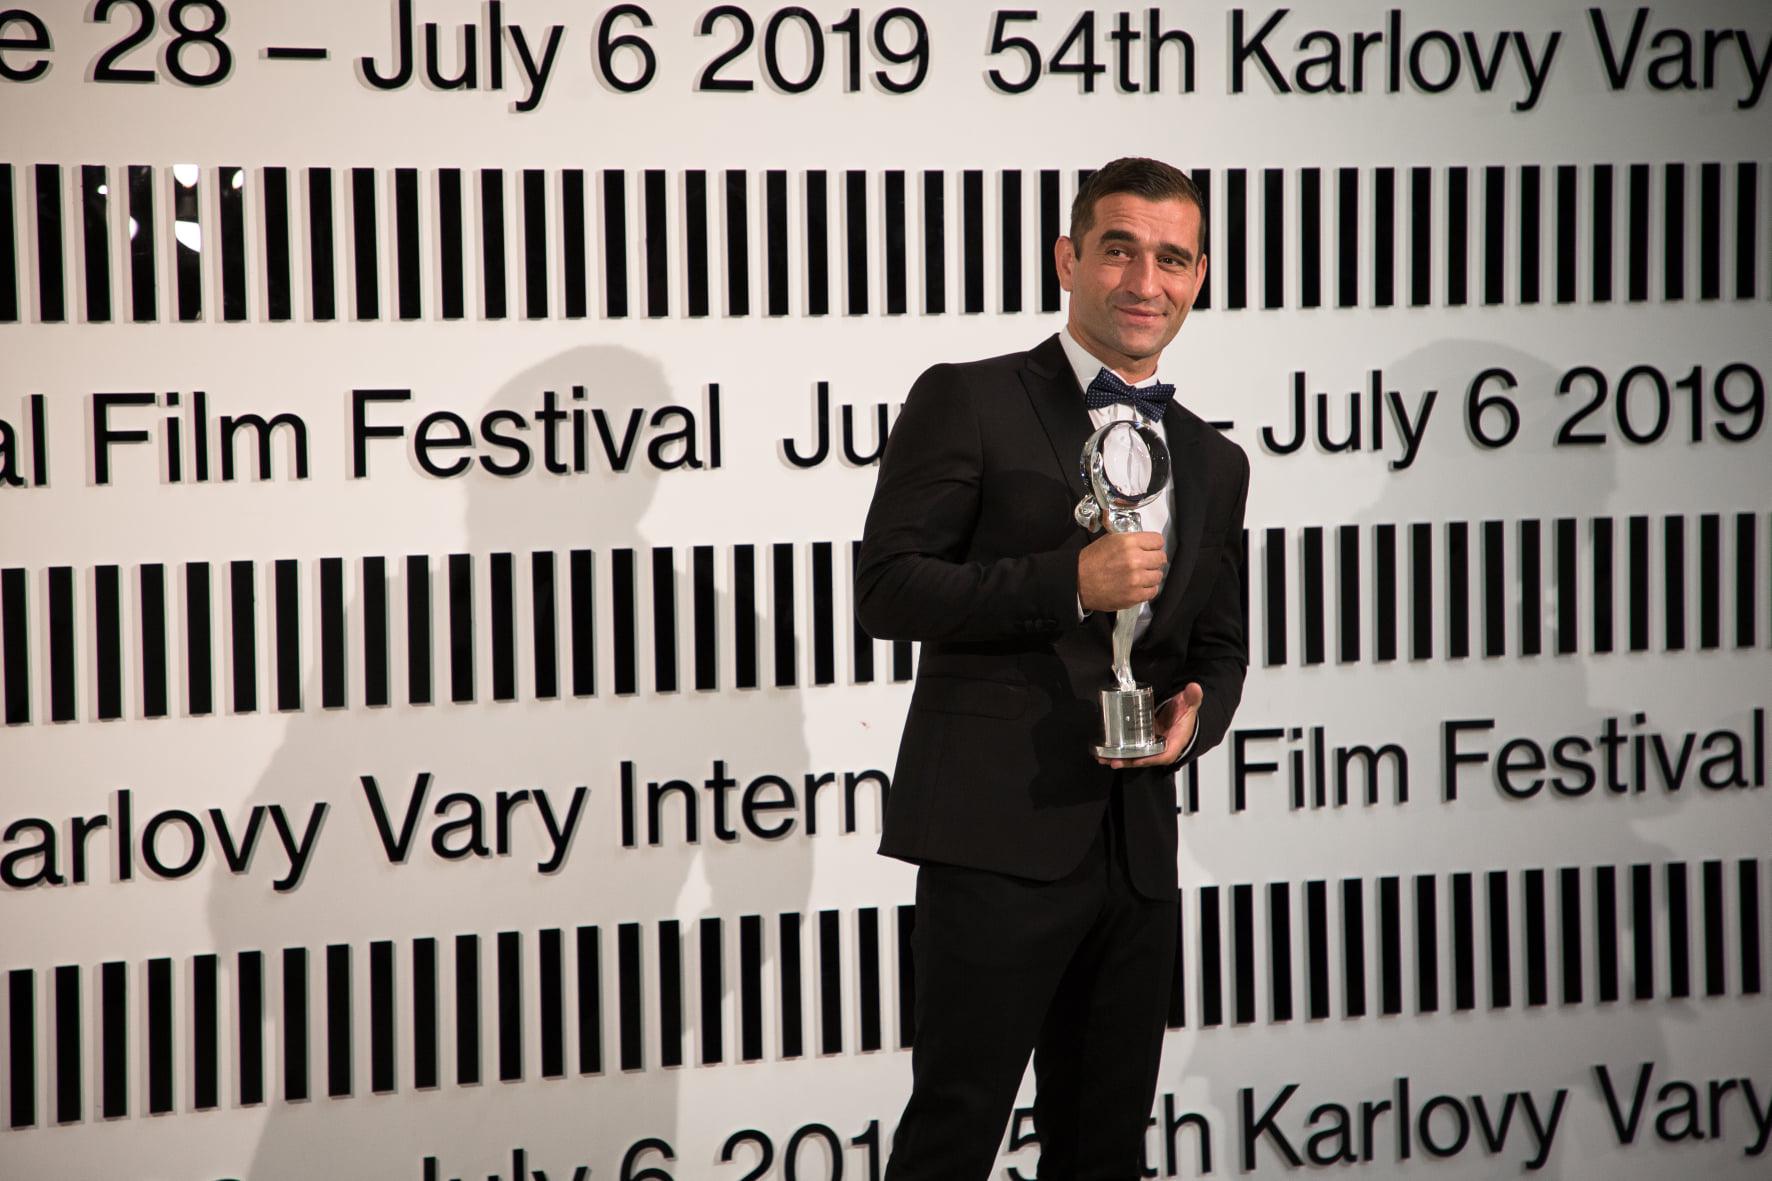 Milan Ondrík was granted the Best Actor Award